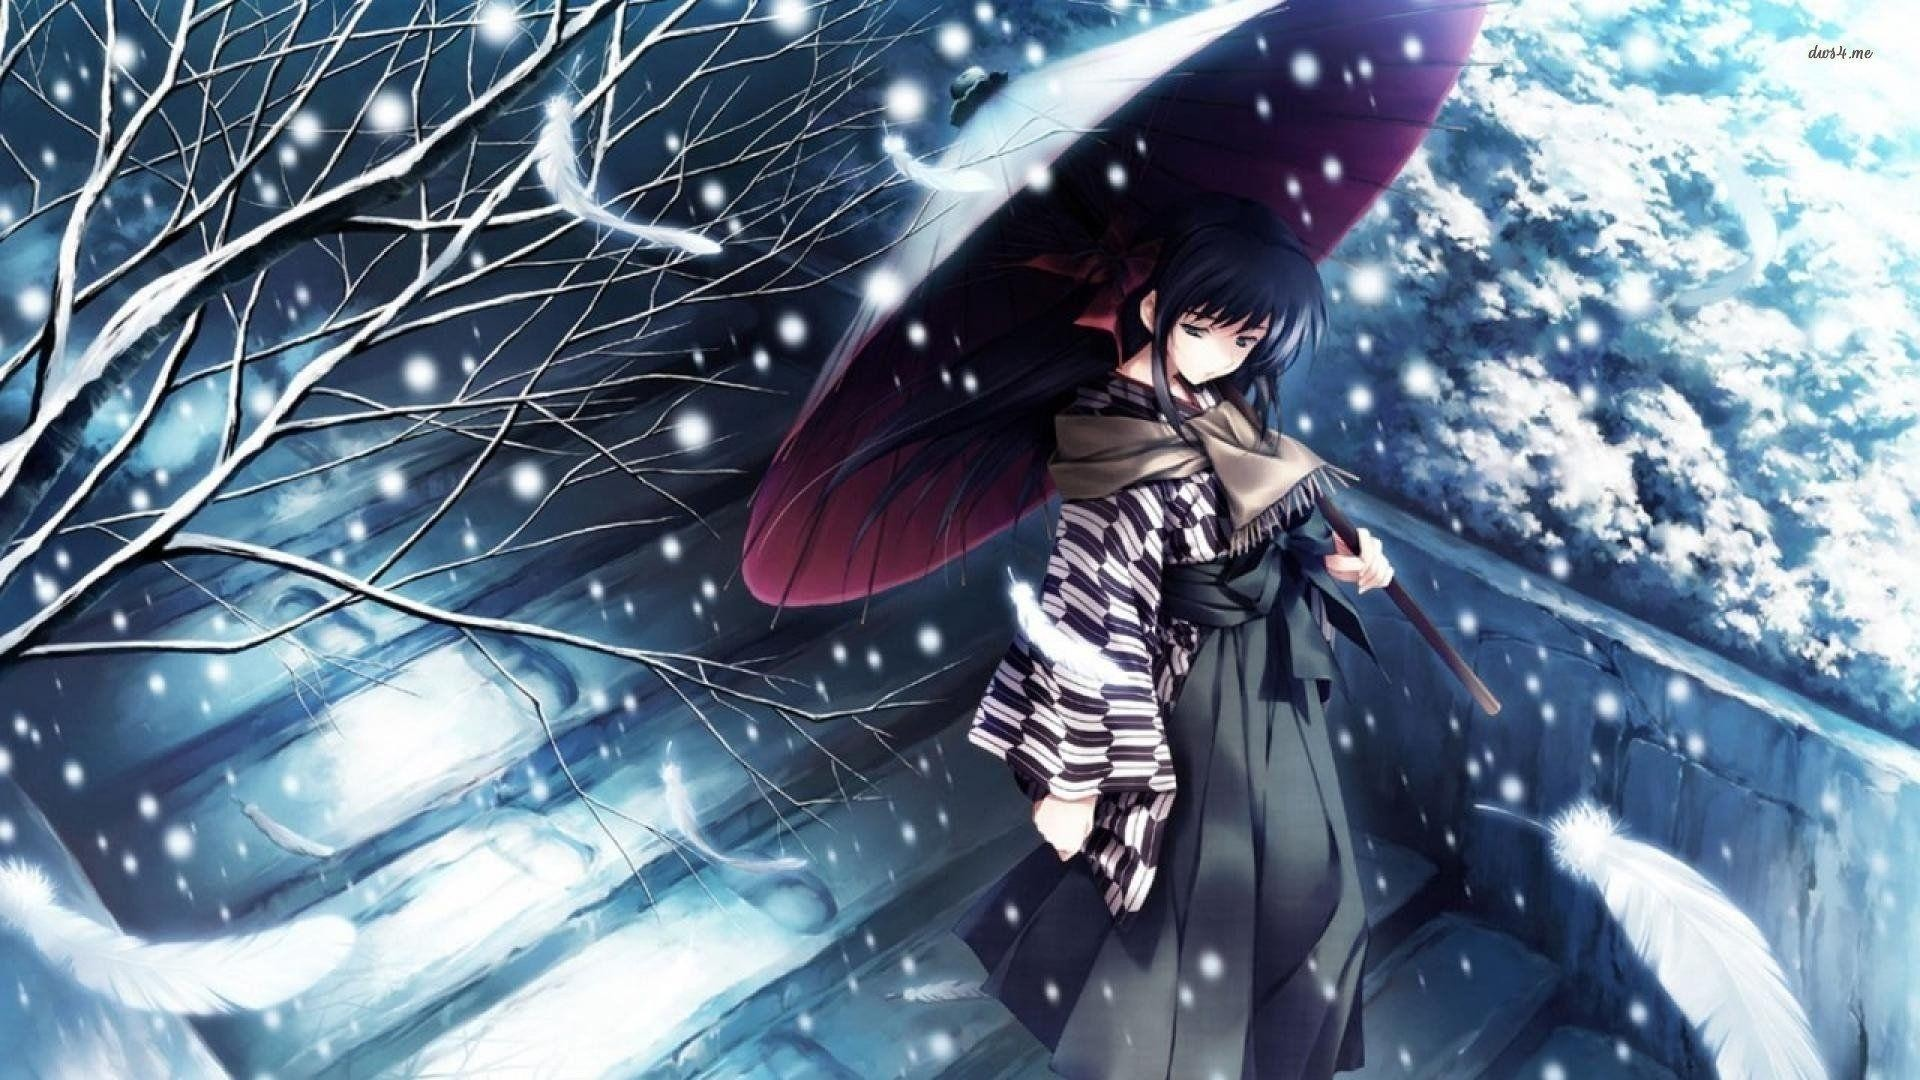 Res: 1920x1080, New Anime Sad Girl Wallpaper Collection - Snow tree kimono girl alone sad  anime blue wallpaper